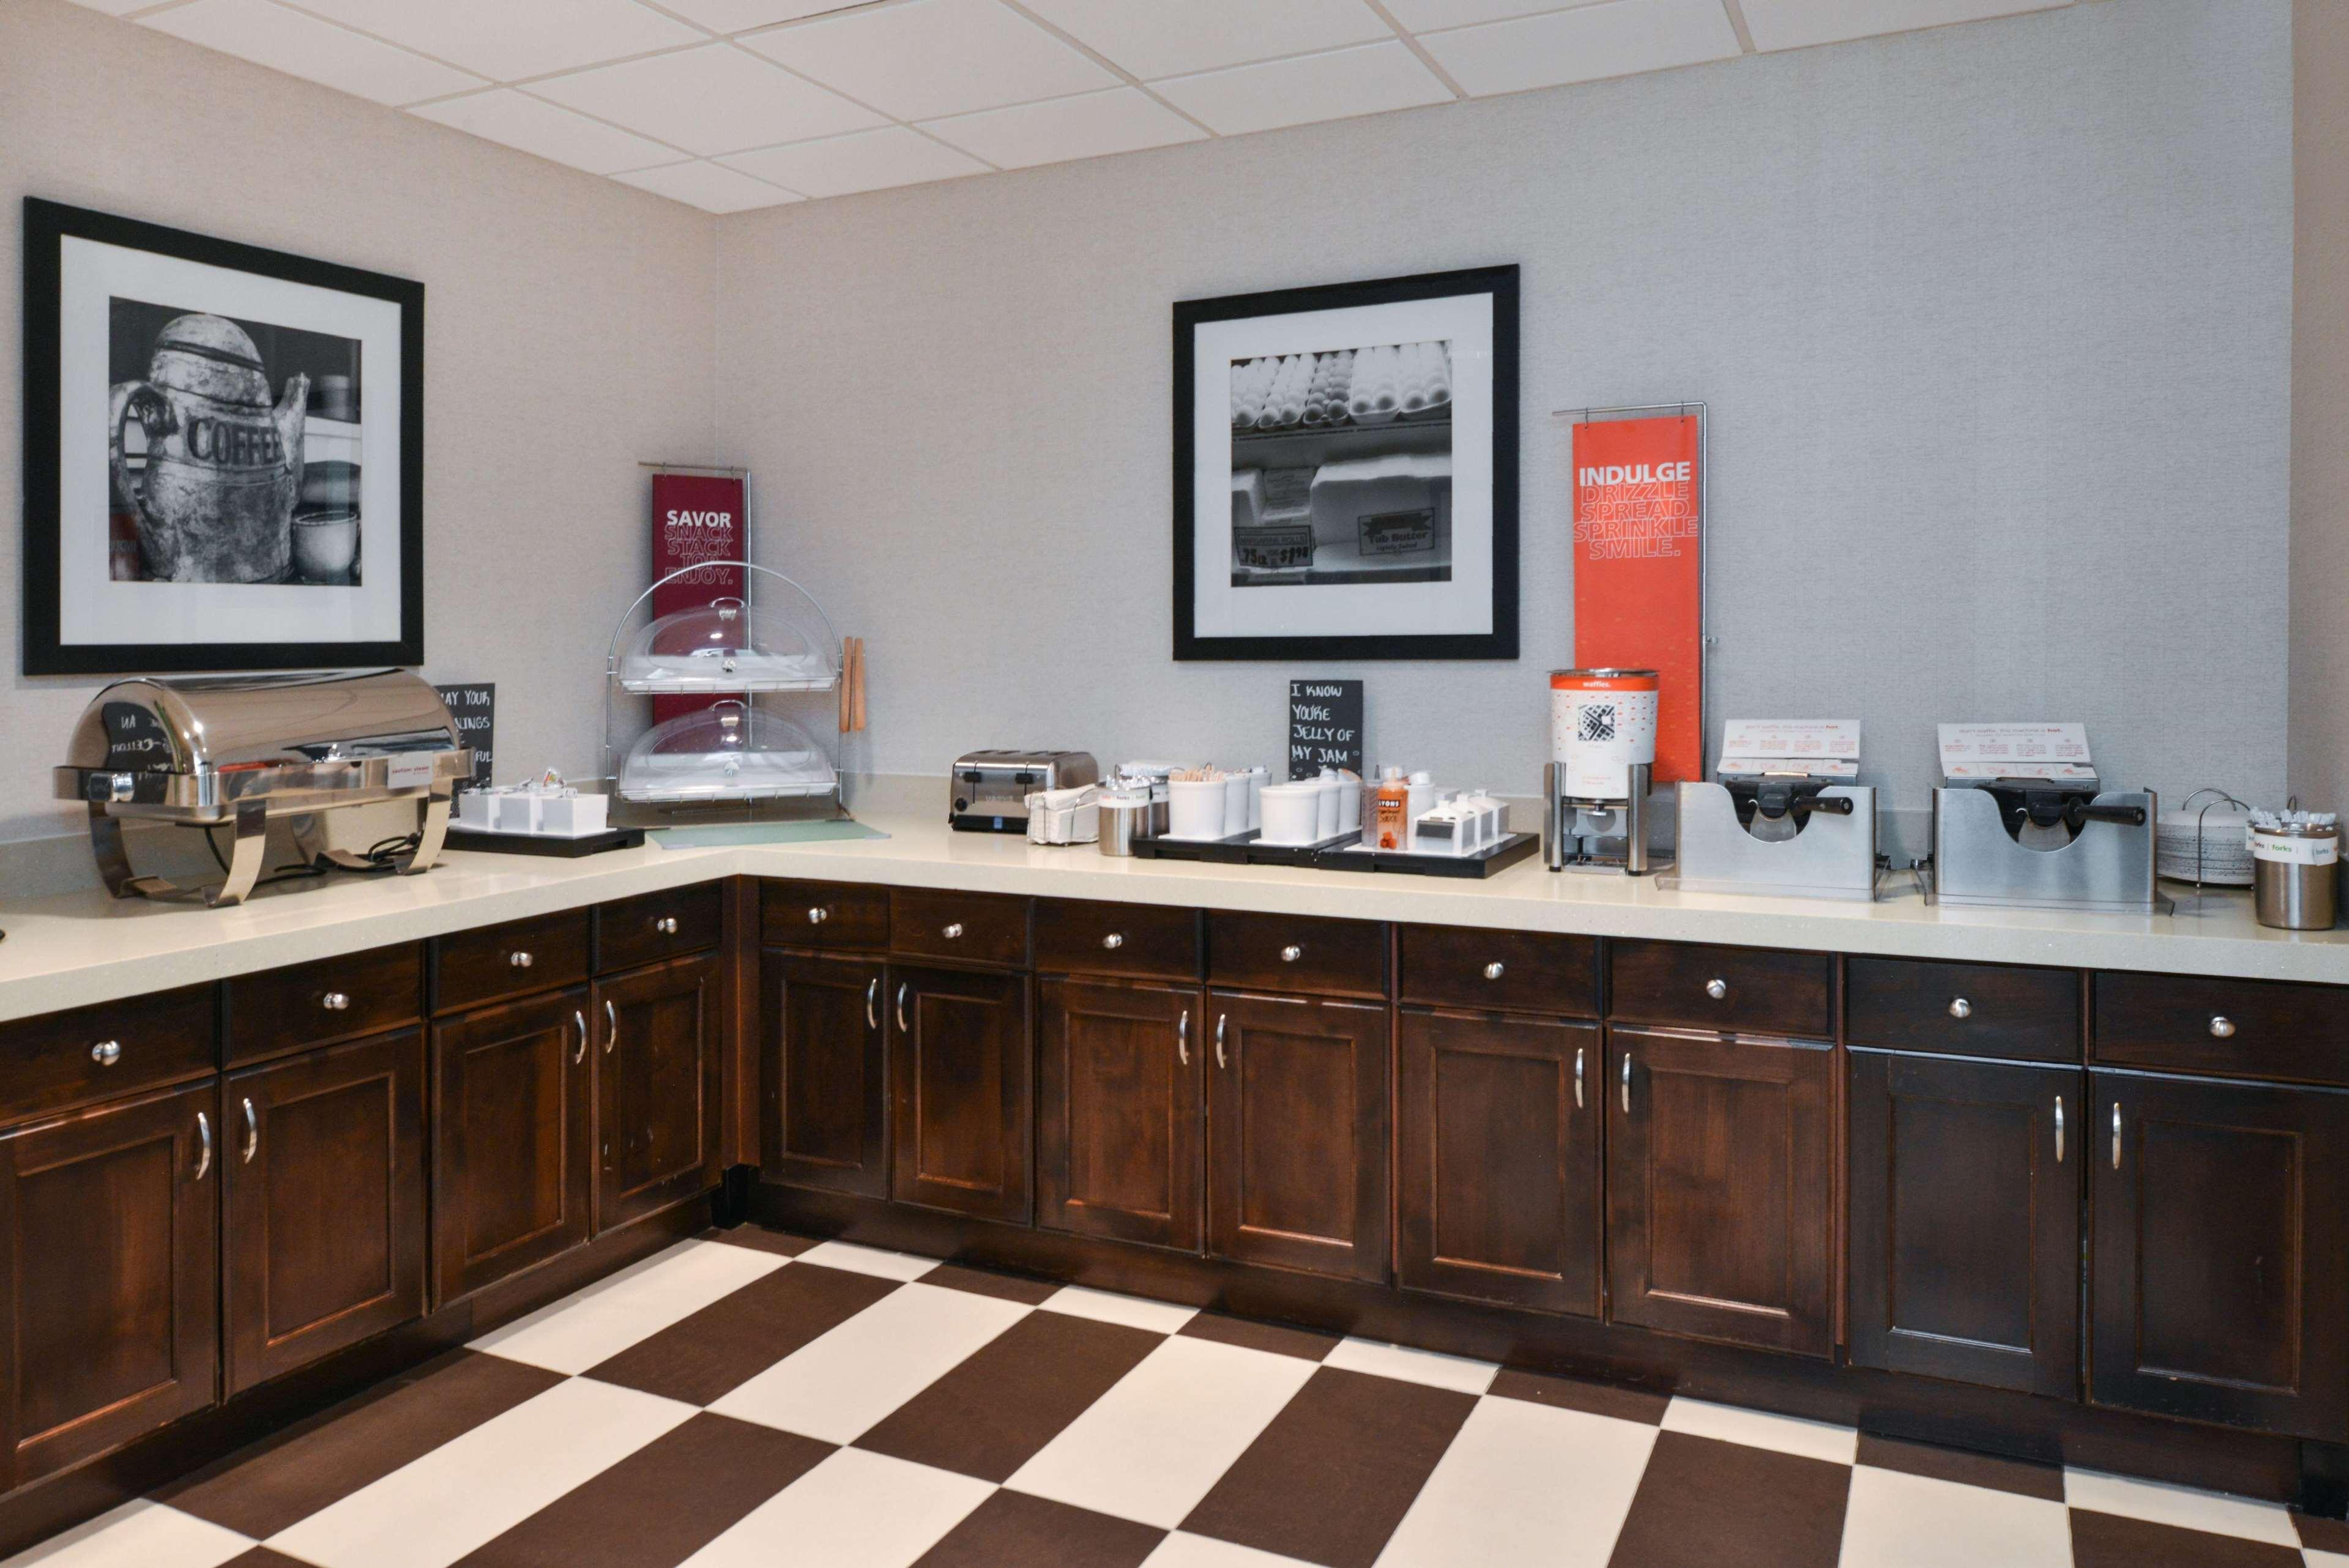 Hampton Inn & Suites Denver-Speer Boulevard image 37